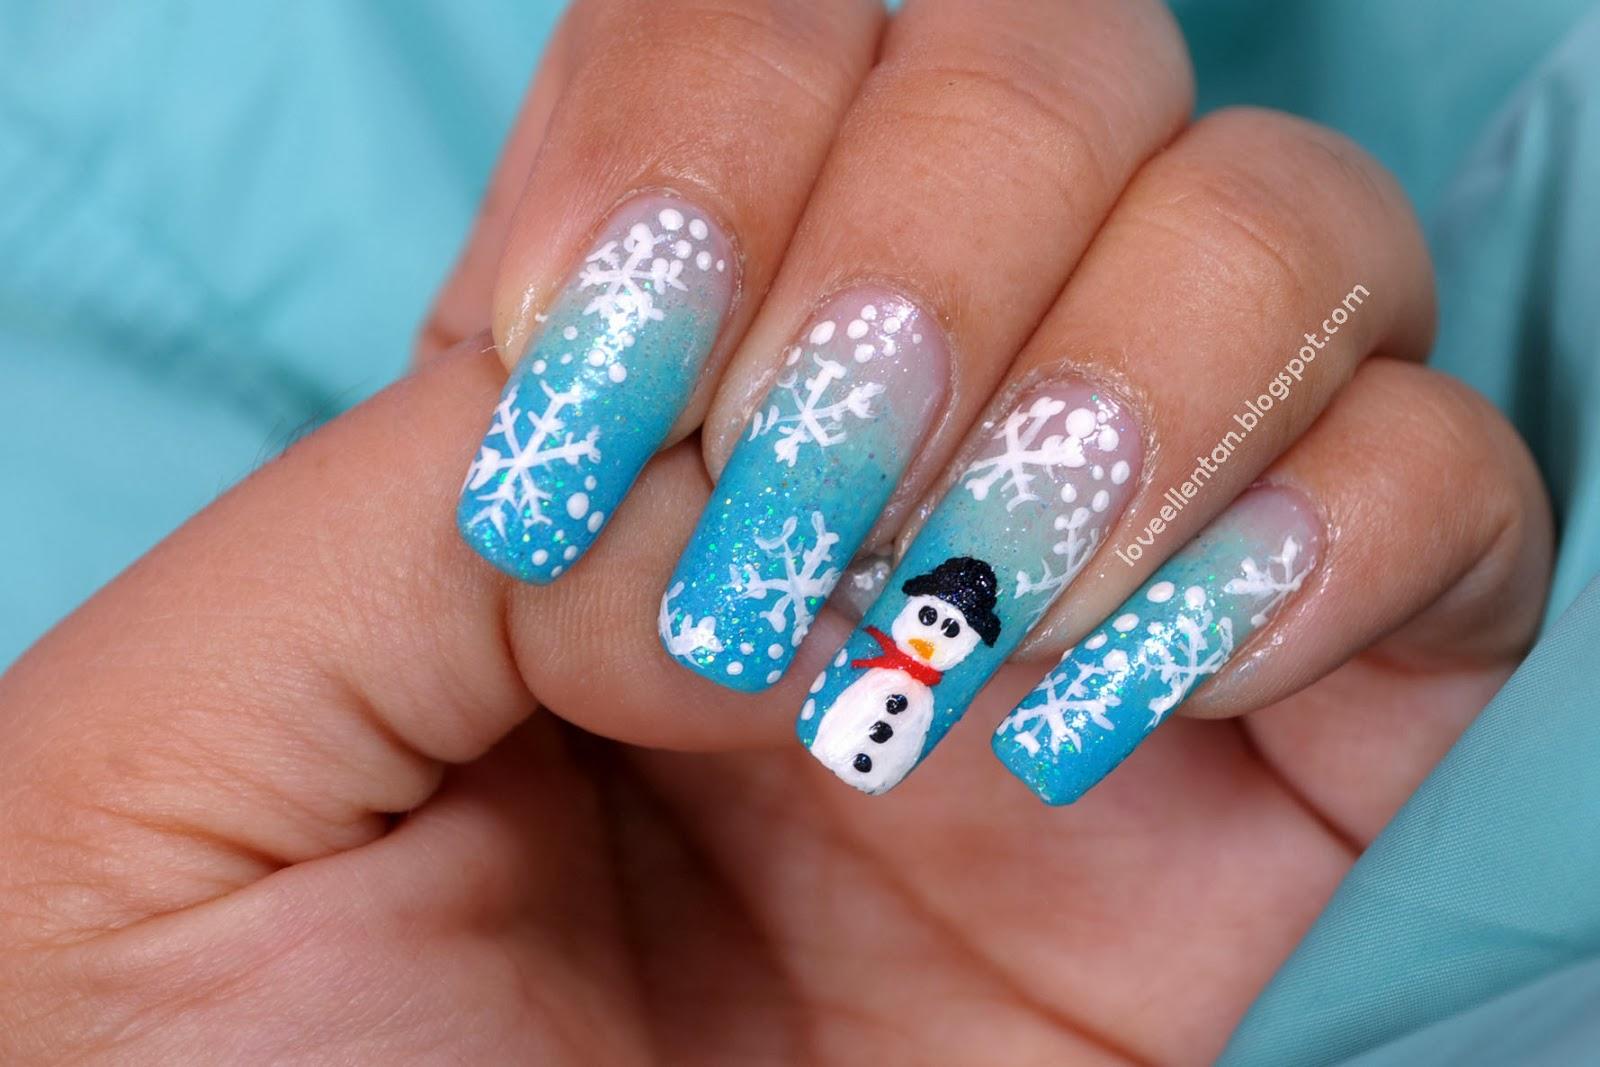 snowflake nail art tutorial loveellentan. Black Bedroom Furniture Sets. Home Design Ideas